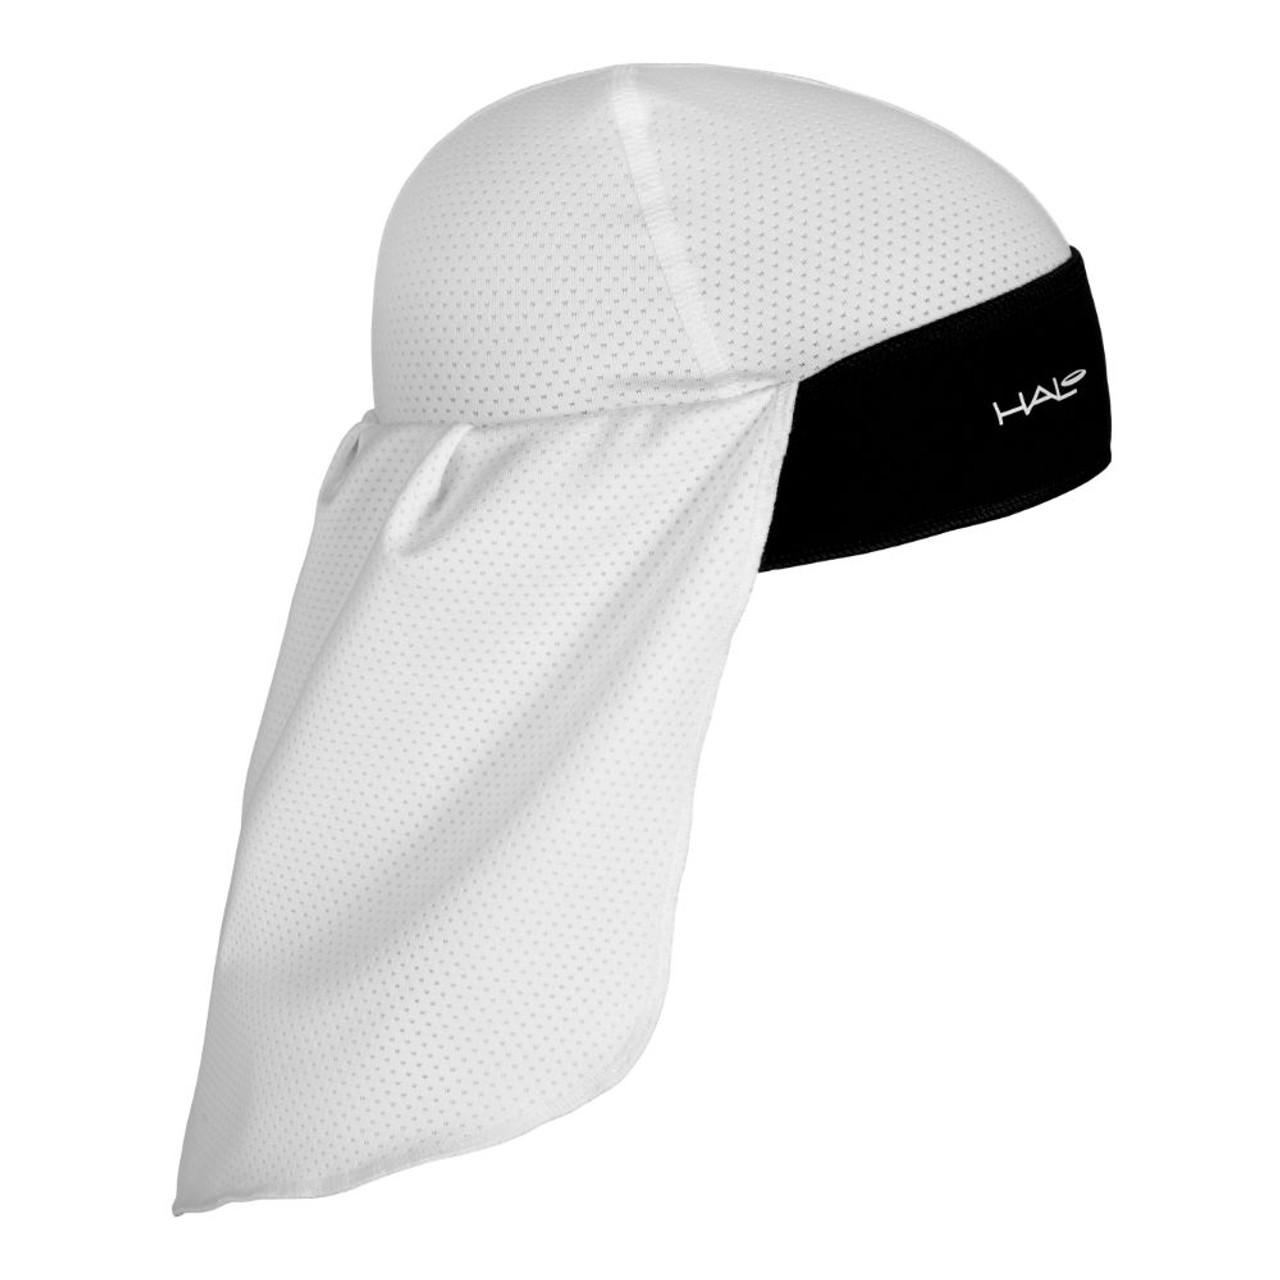 nouvelle sélection classcic où acheter Halo Solar Skull Cap and Tail for Neck Protection - White